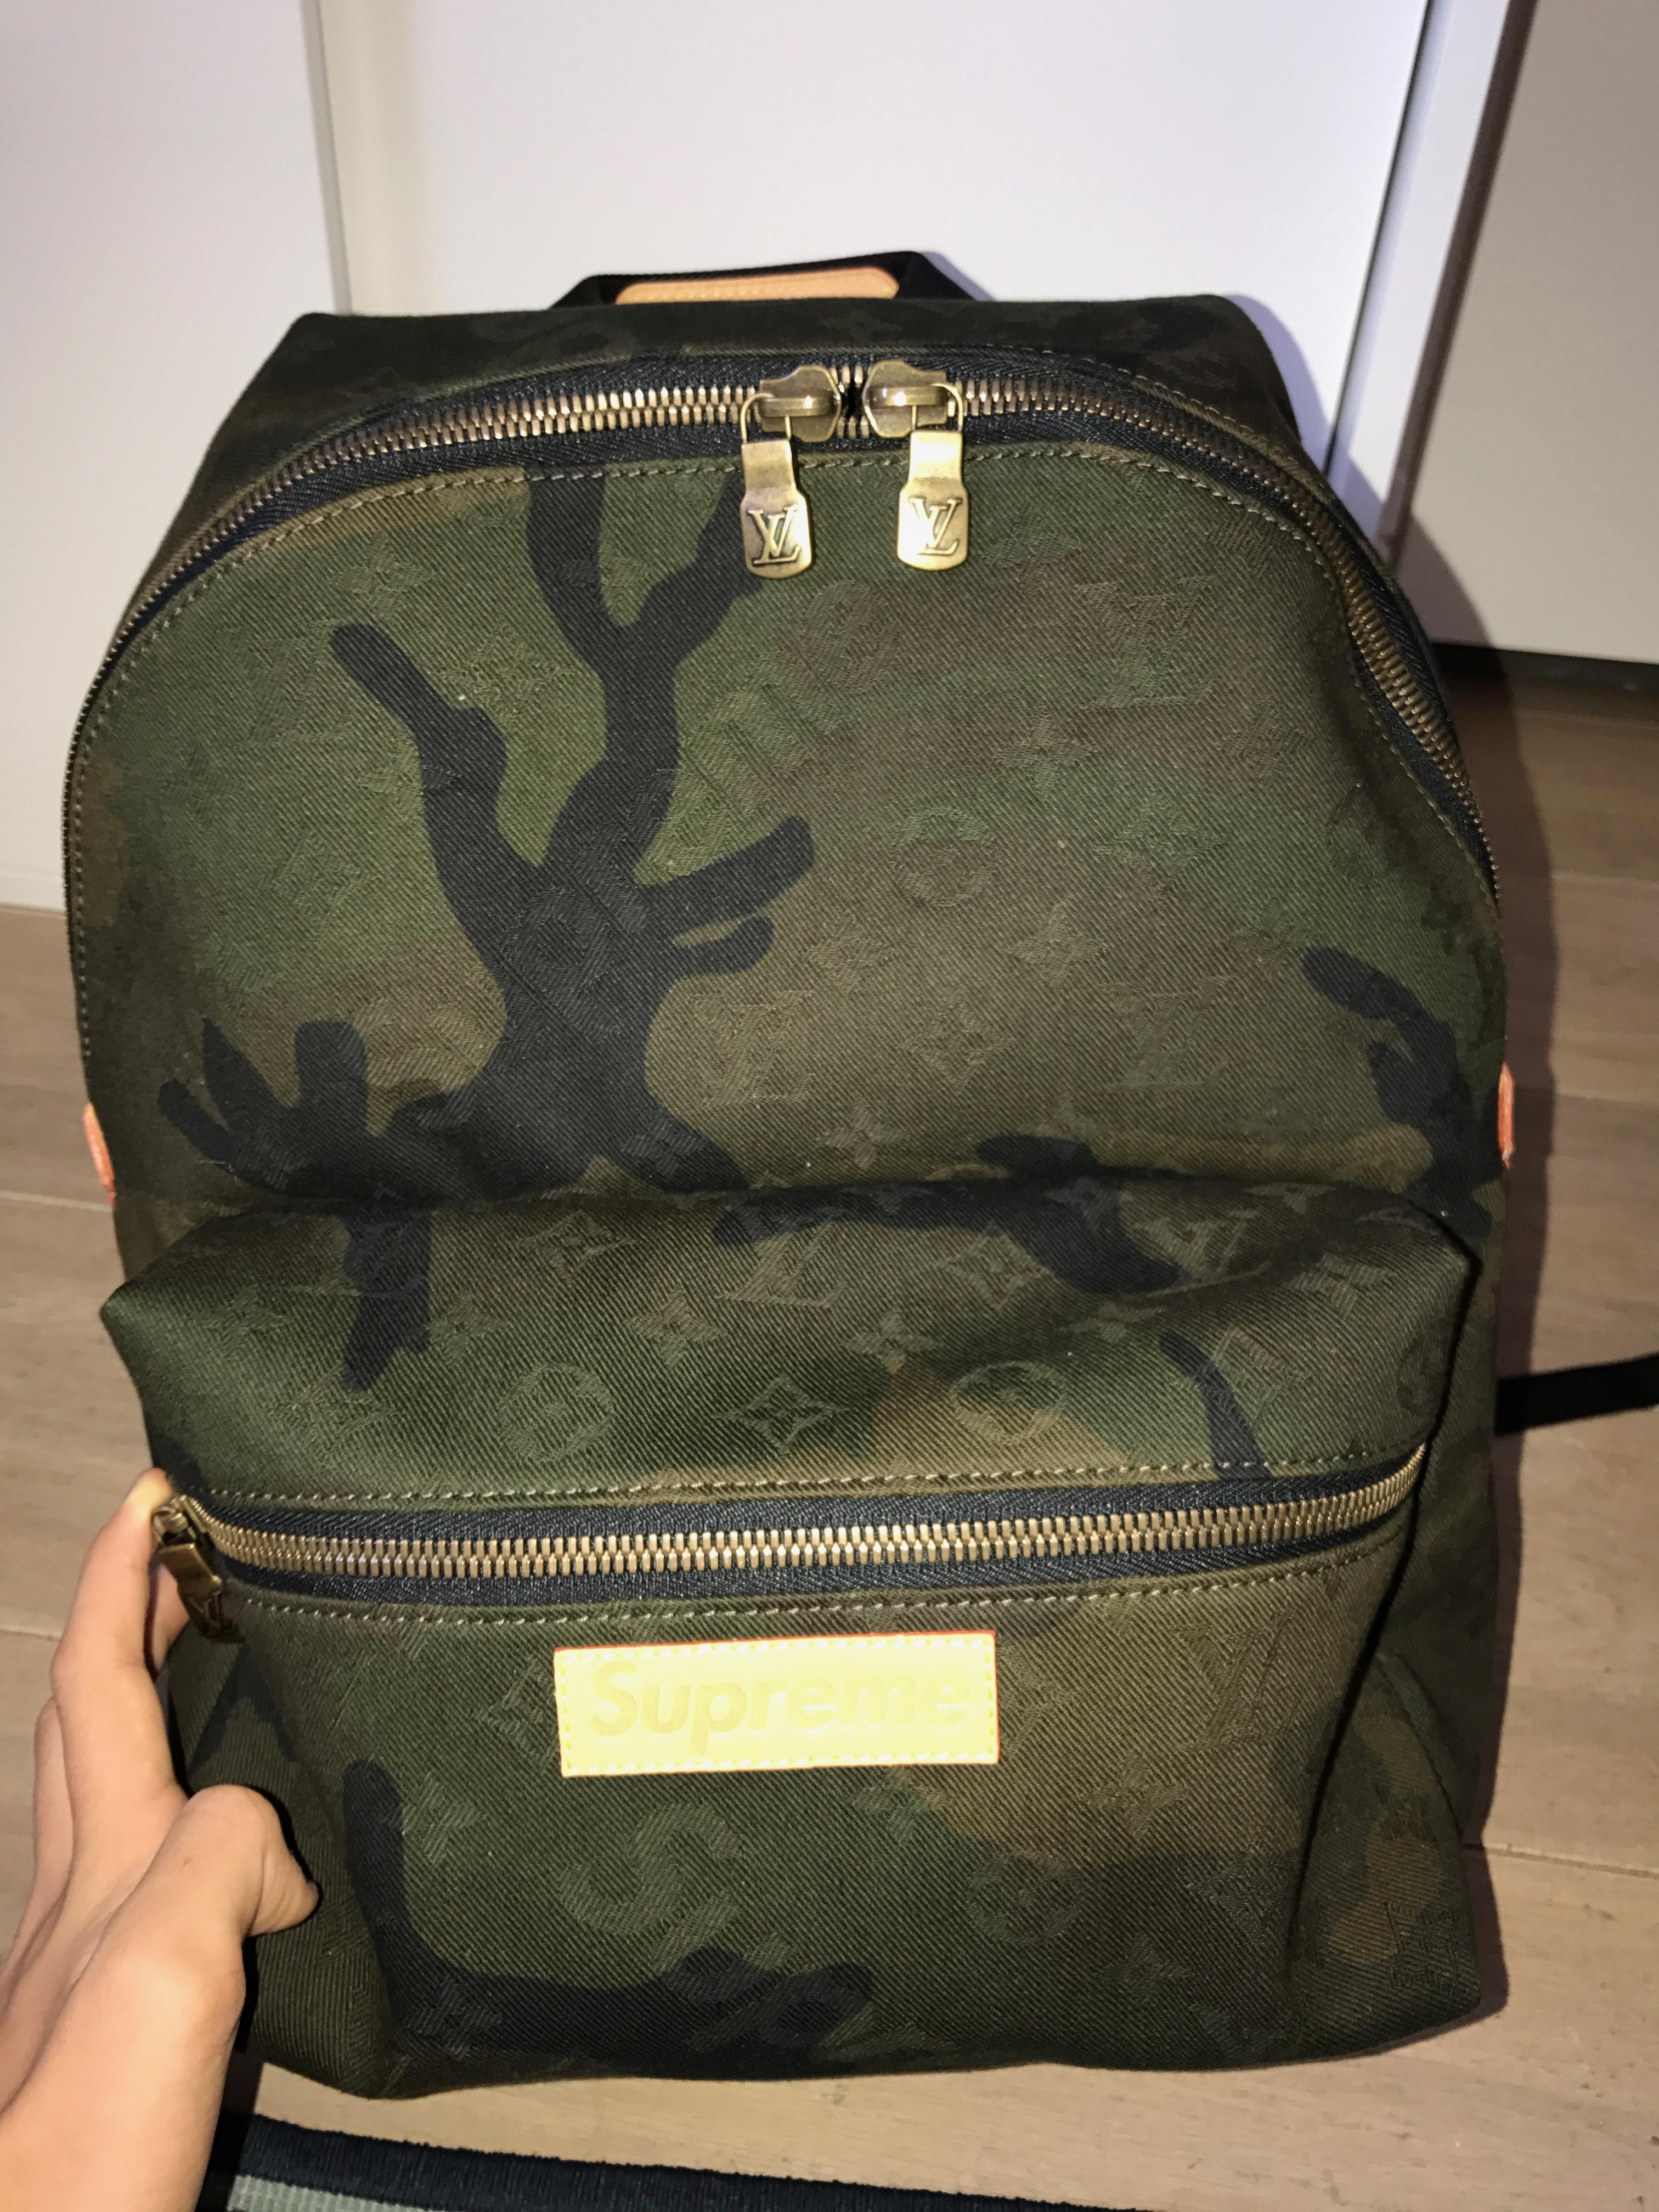 43921109f9c6 Supreme APOLLO BACKPACK CAMO SUPREME LV LOUIS VUITTON Size one size - Bags    Luggage for Sale - Grailed